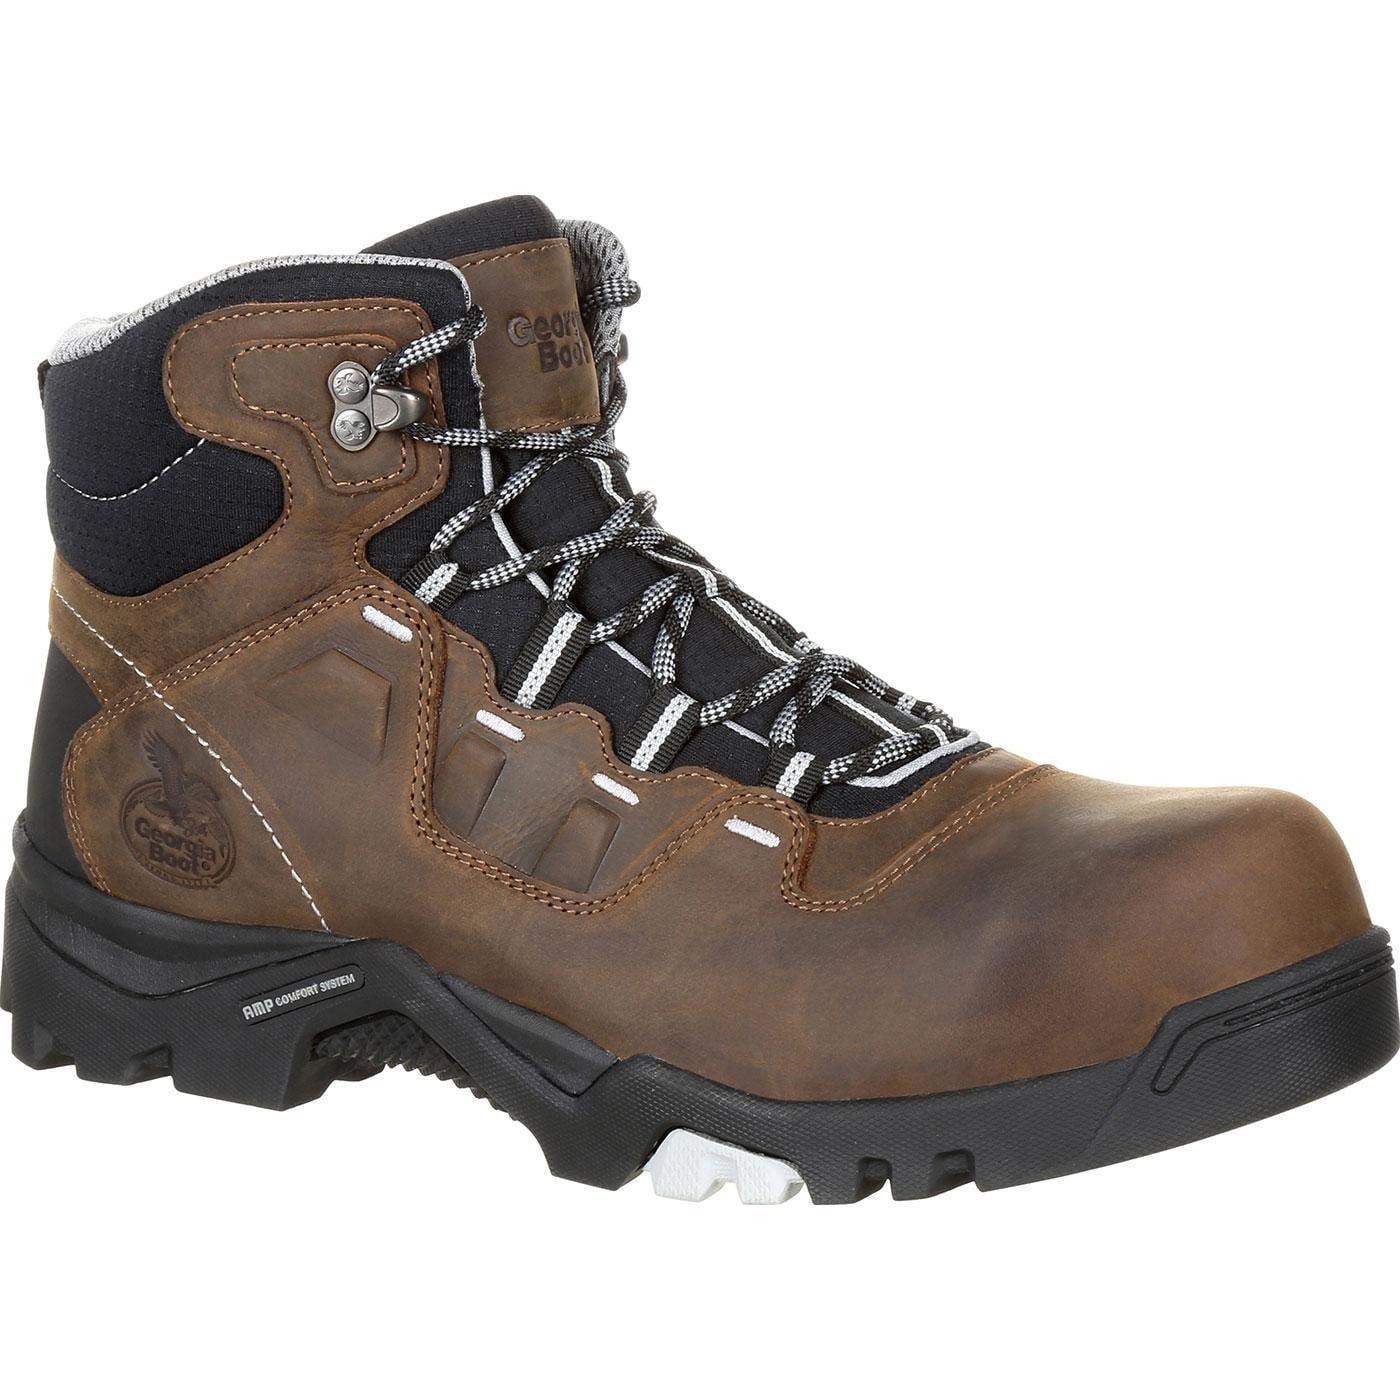 4dd53e4d009 Georgia Boot Amplitude Composite Toe Waterproof Work Boot, #GB00216